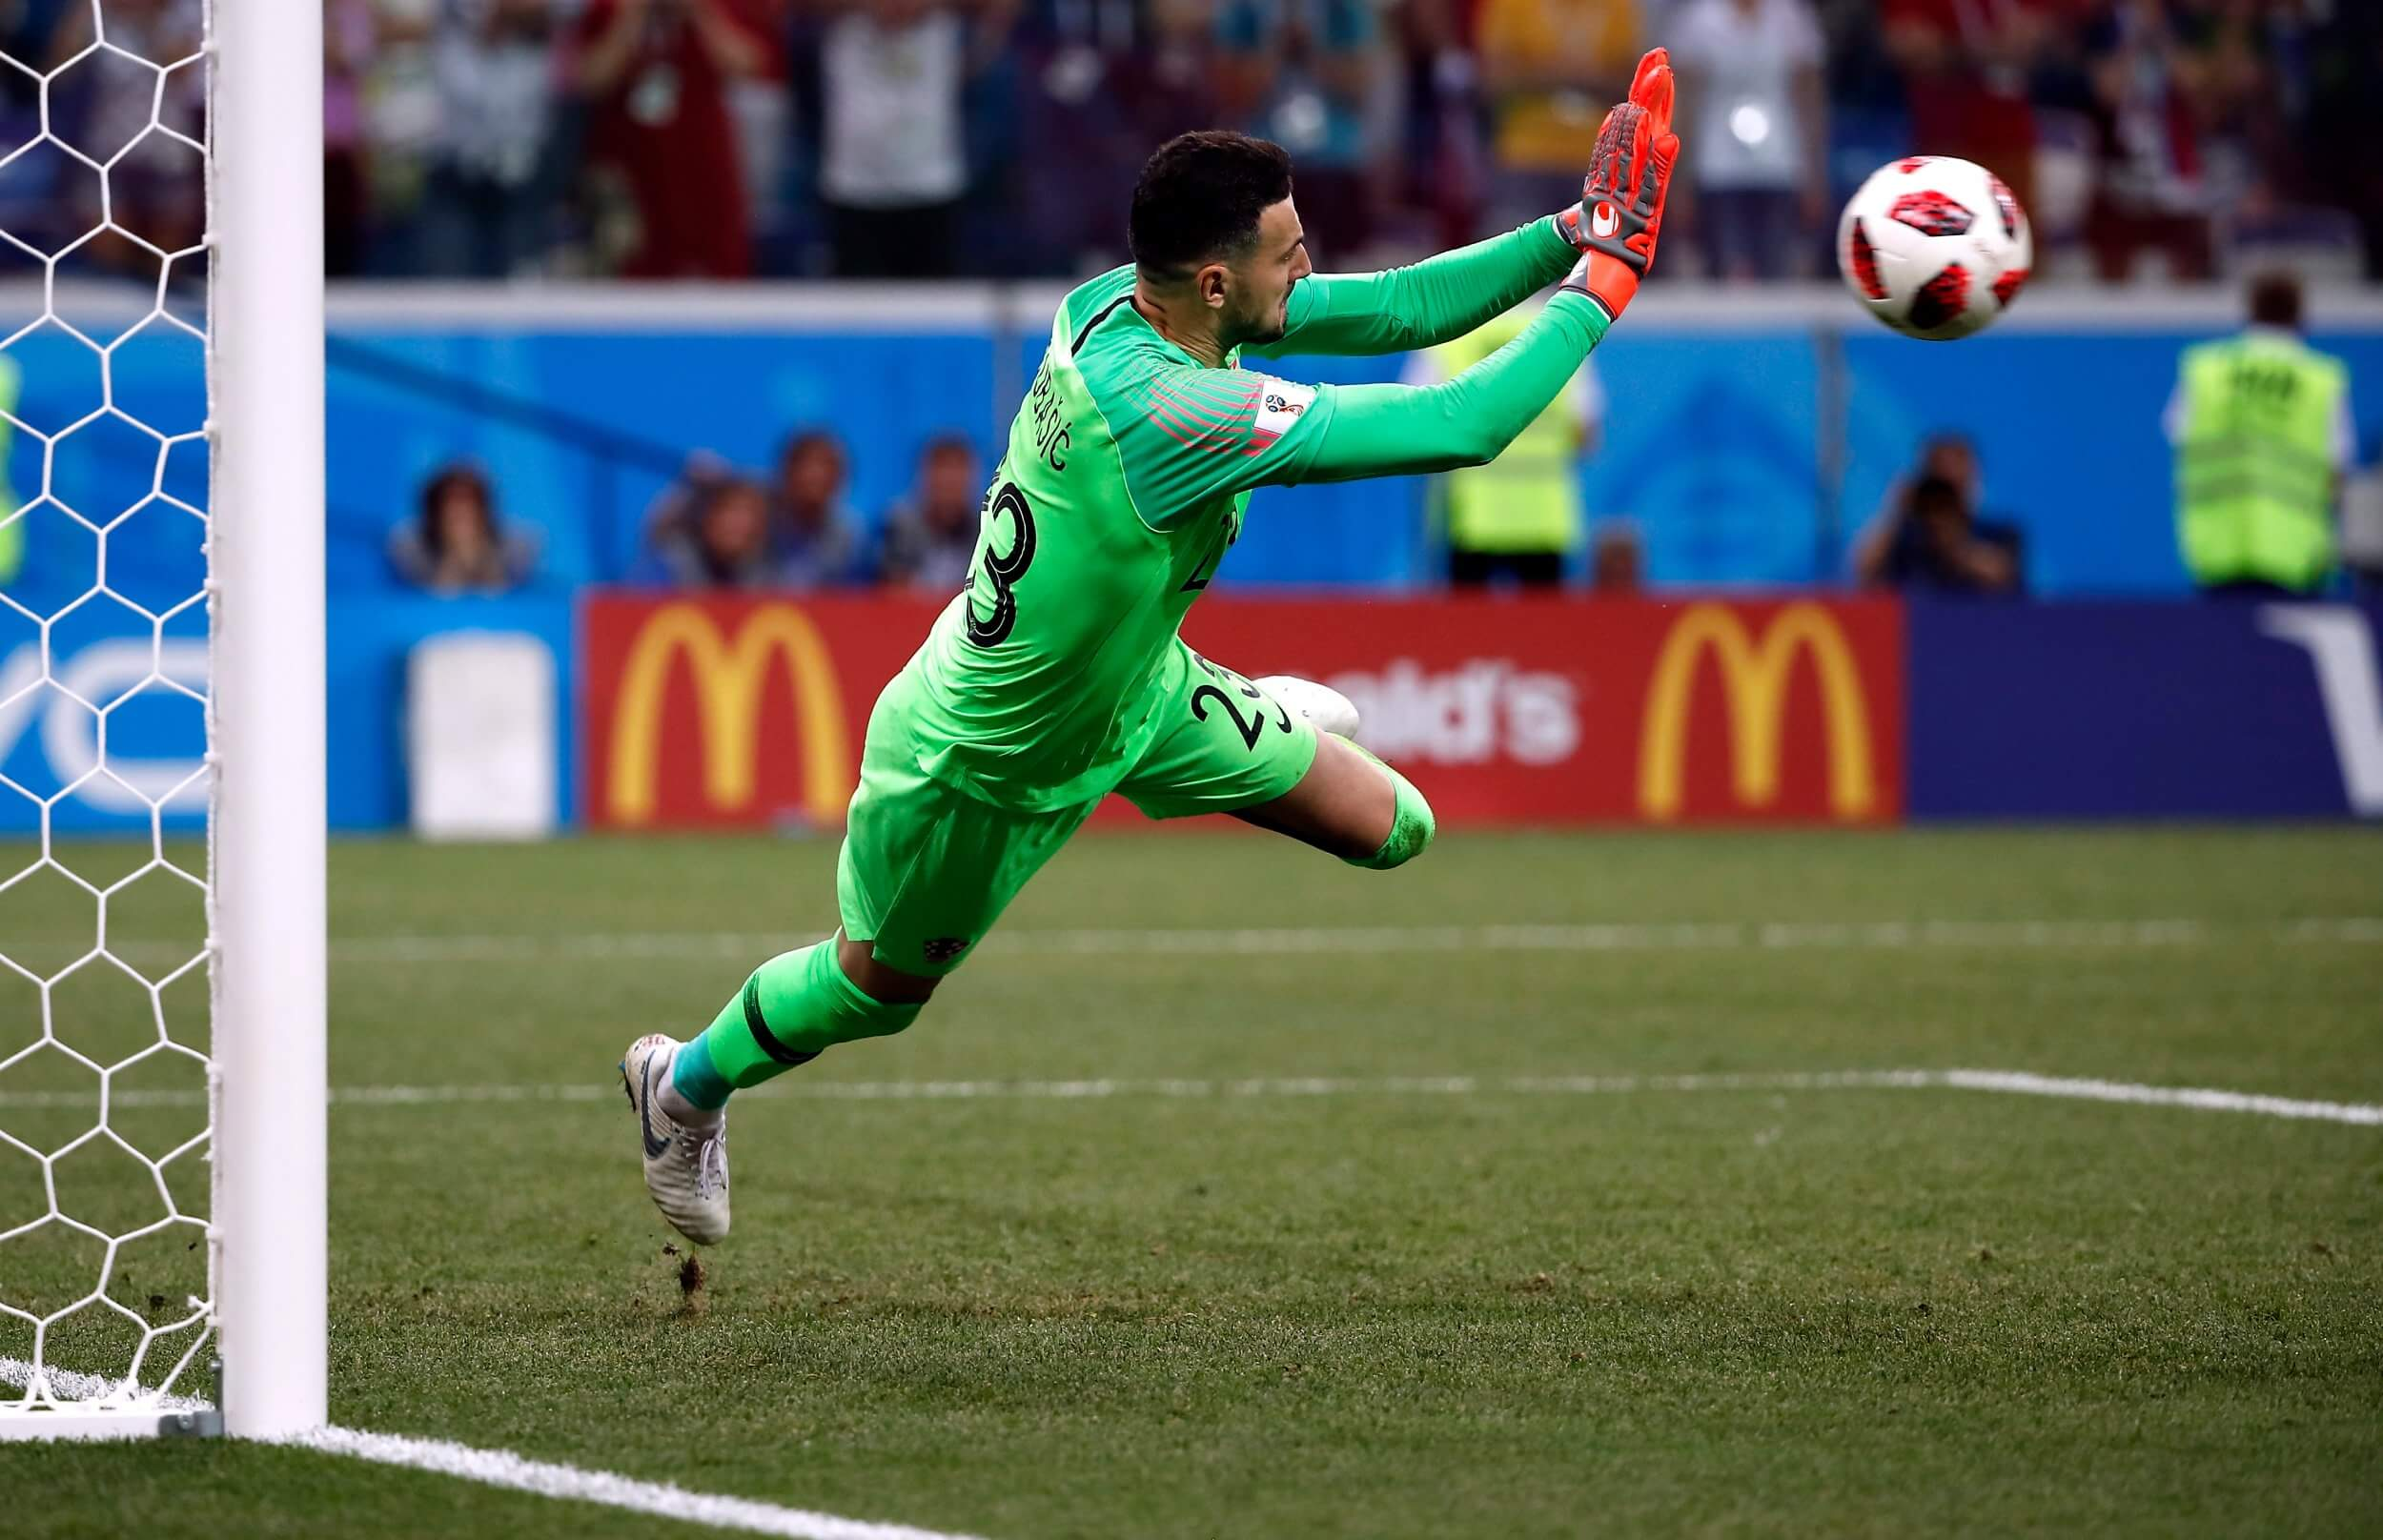 बुहुम काप Round of 16: क्रोएसियाआ डेनमार्कखौ 3-2 आव फेजेनो